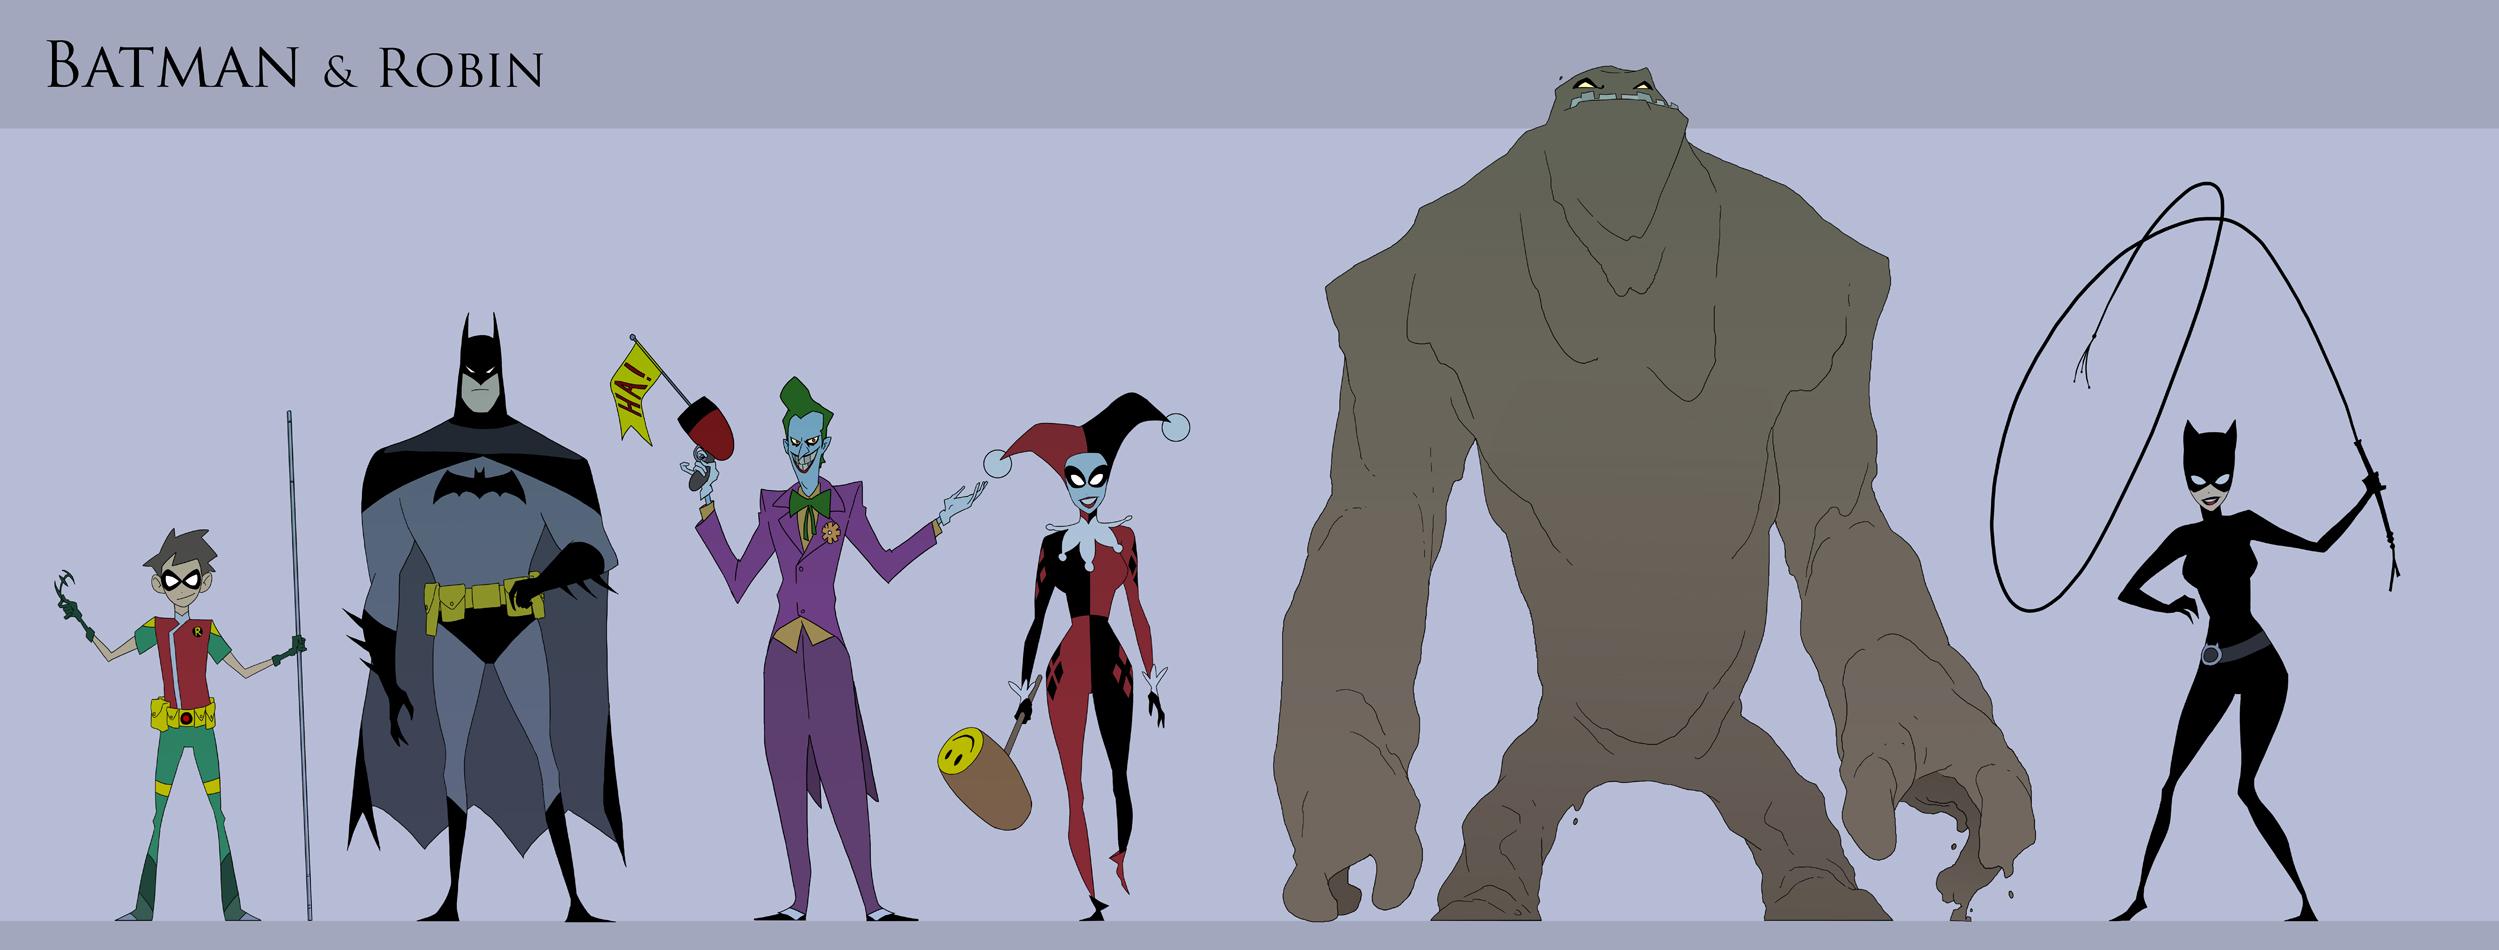 Batman and Robin Animated..... again by drazebot